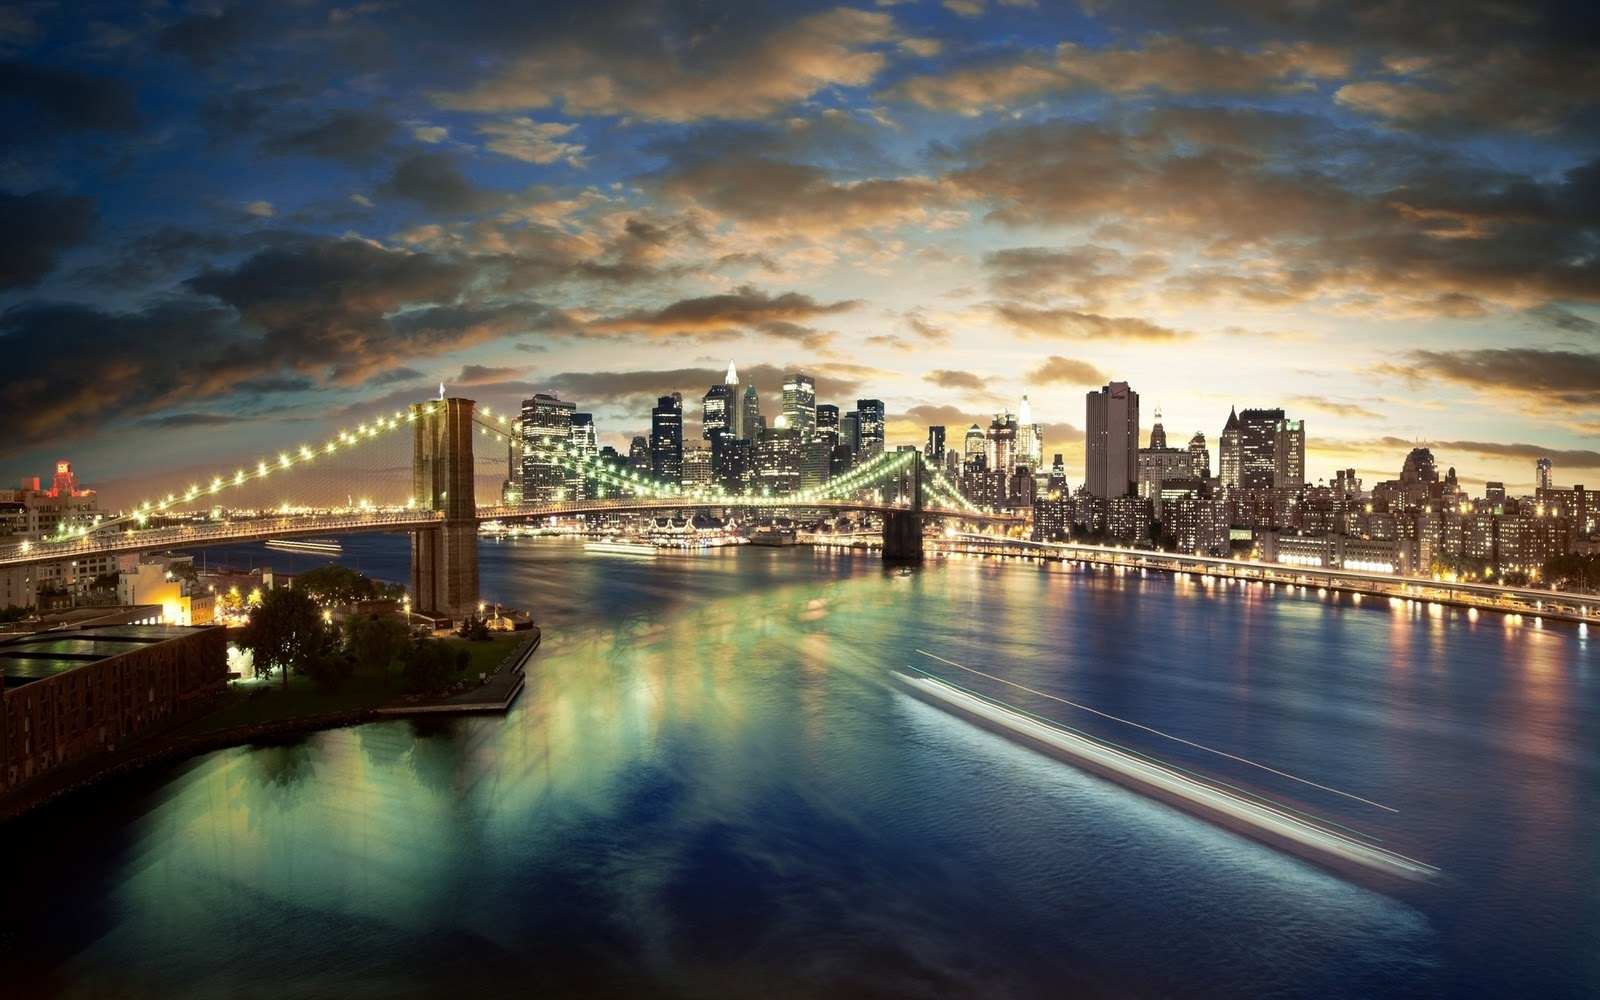 http://2.bp.blogspot.com/-MmodUrVb86A/Txl6_G1pRPI/AAAAAAAAELI/cJ3eqoRDWfQ/s1600/new-york-city-8.jpg